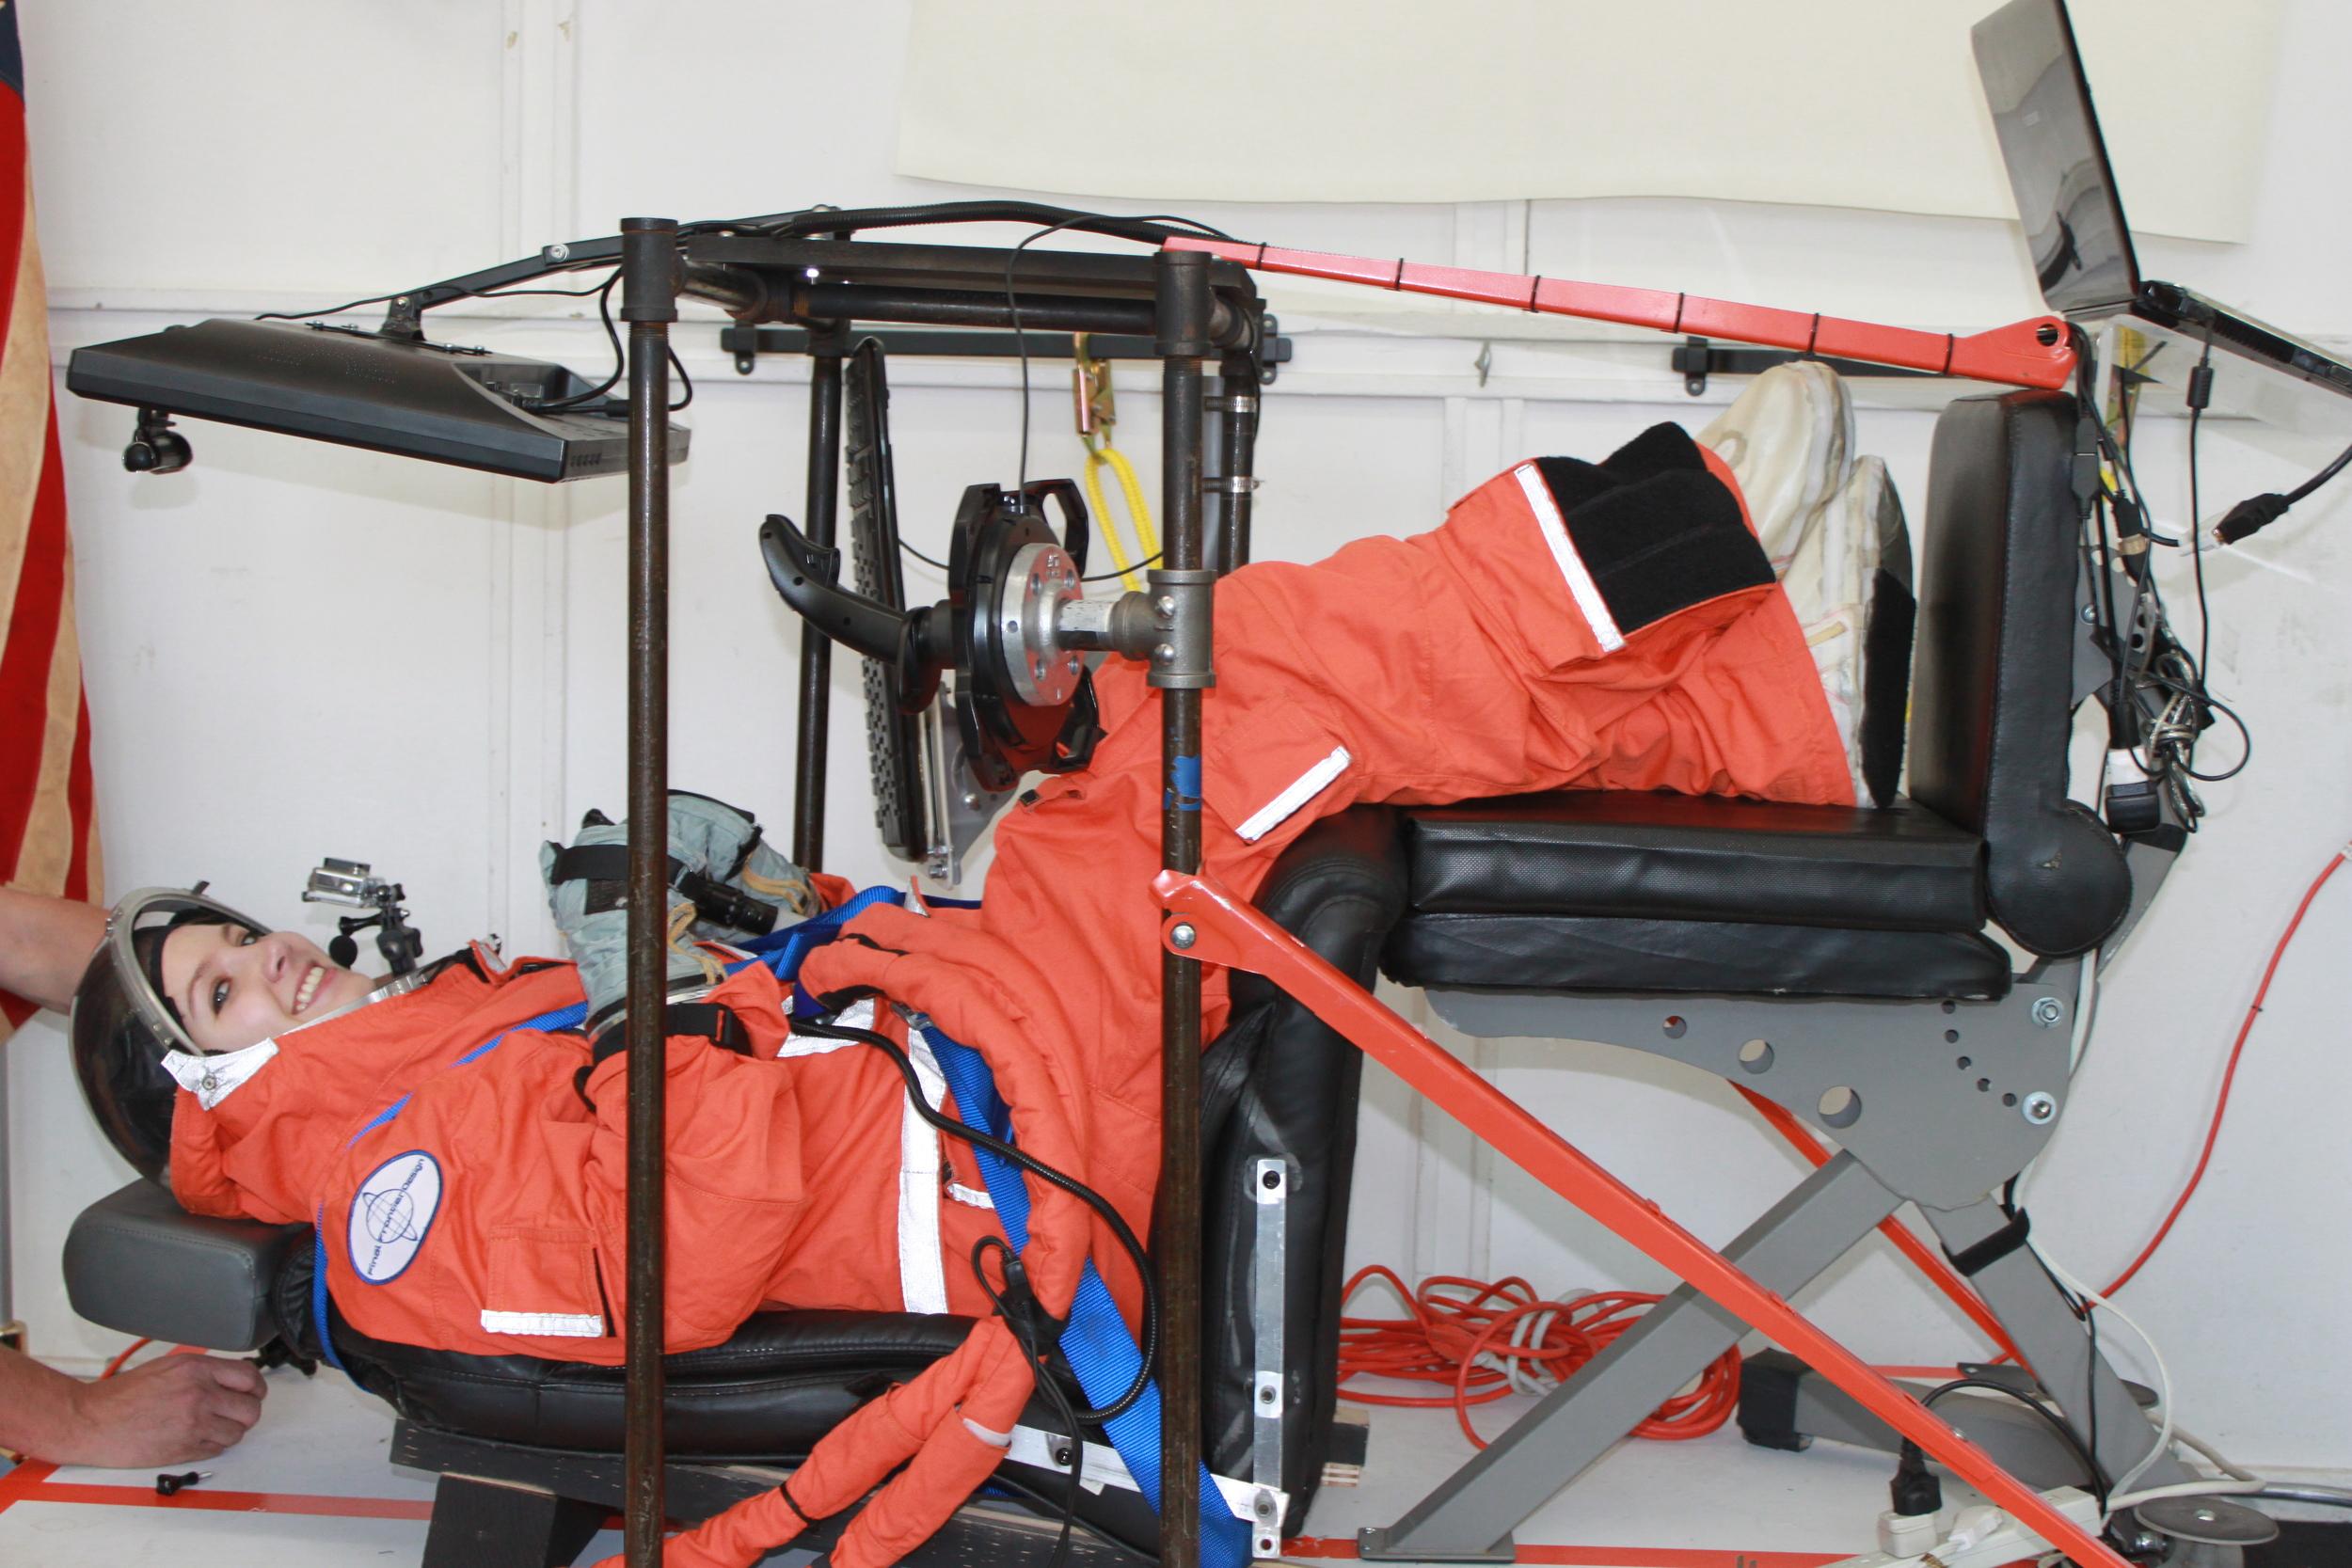 Loren Grush from Popular Science demoing FFD's flight simulator